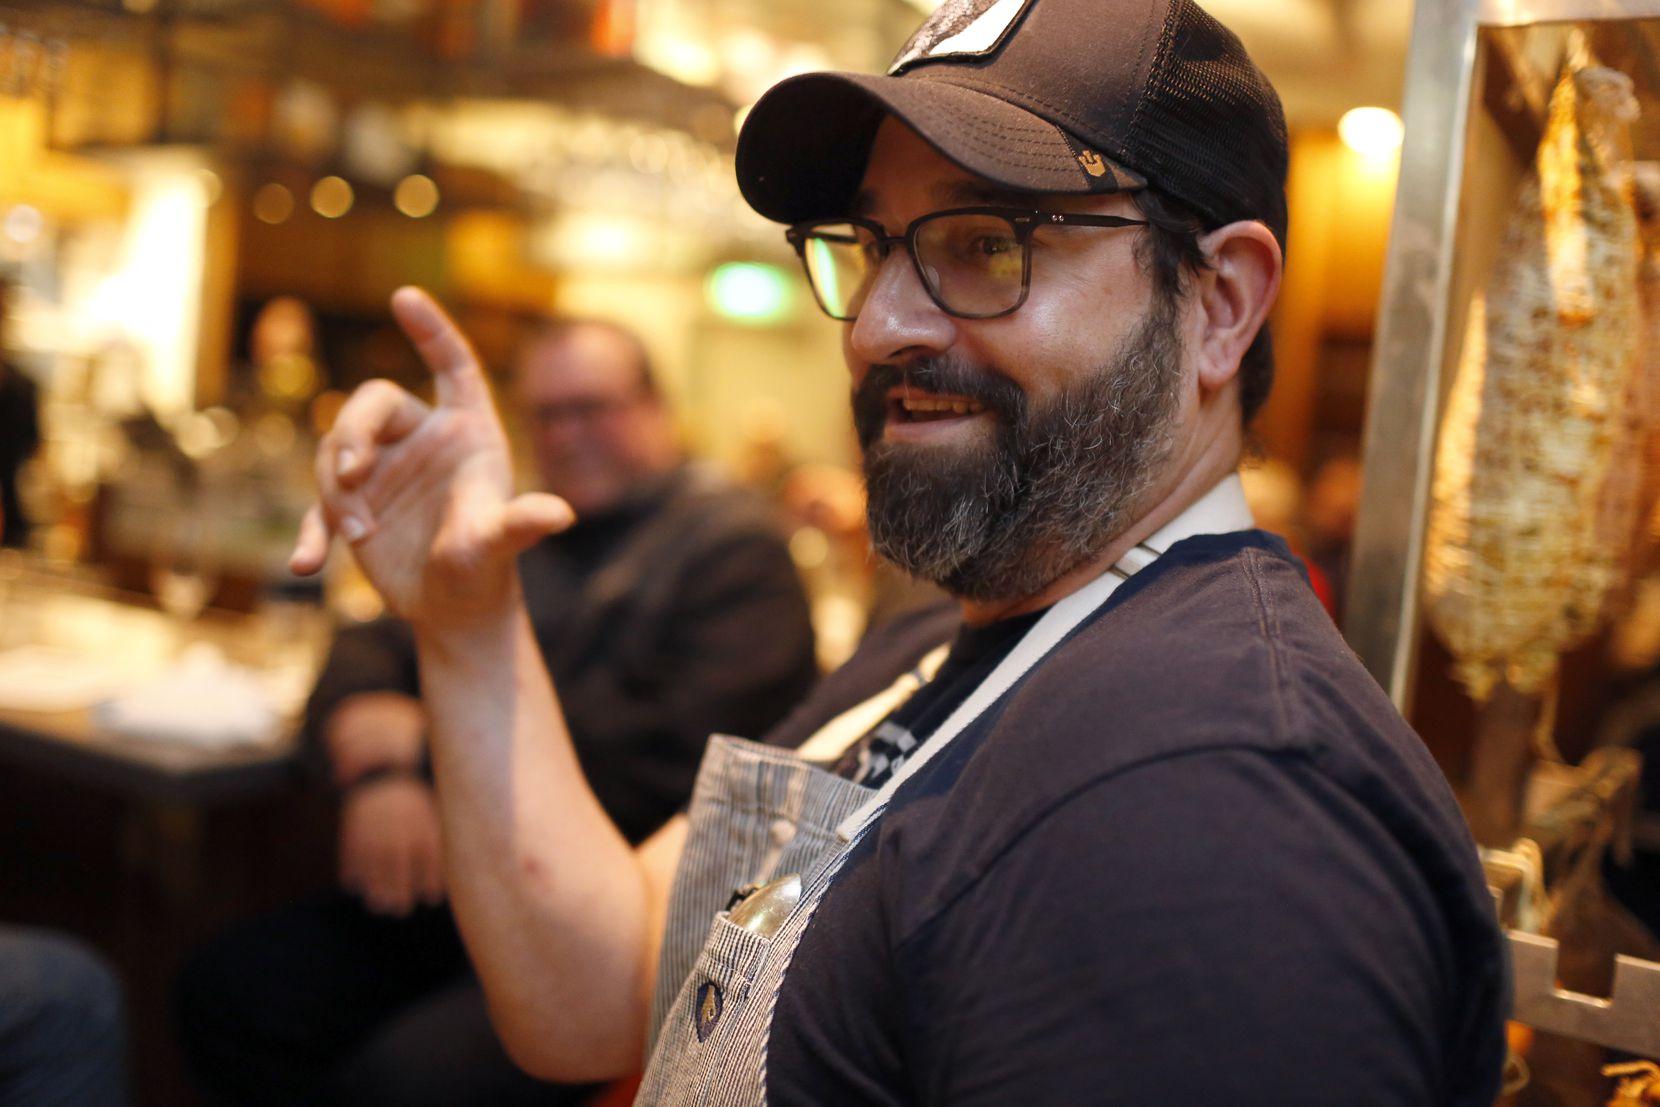 Chef David Uygur at Macellaio